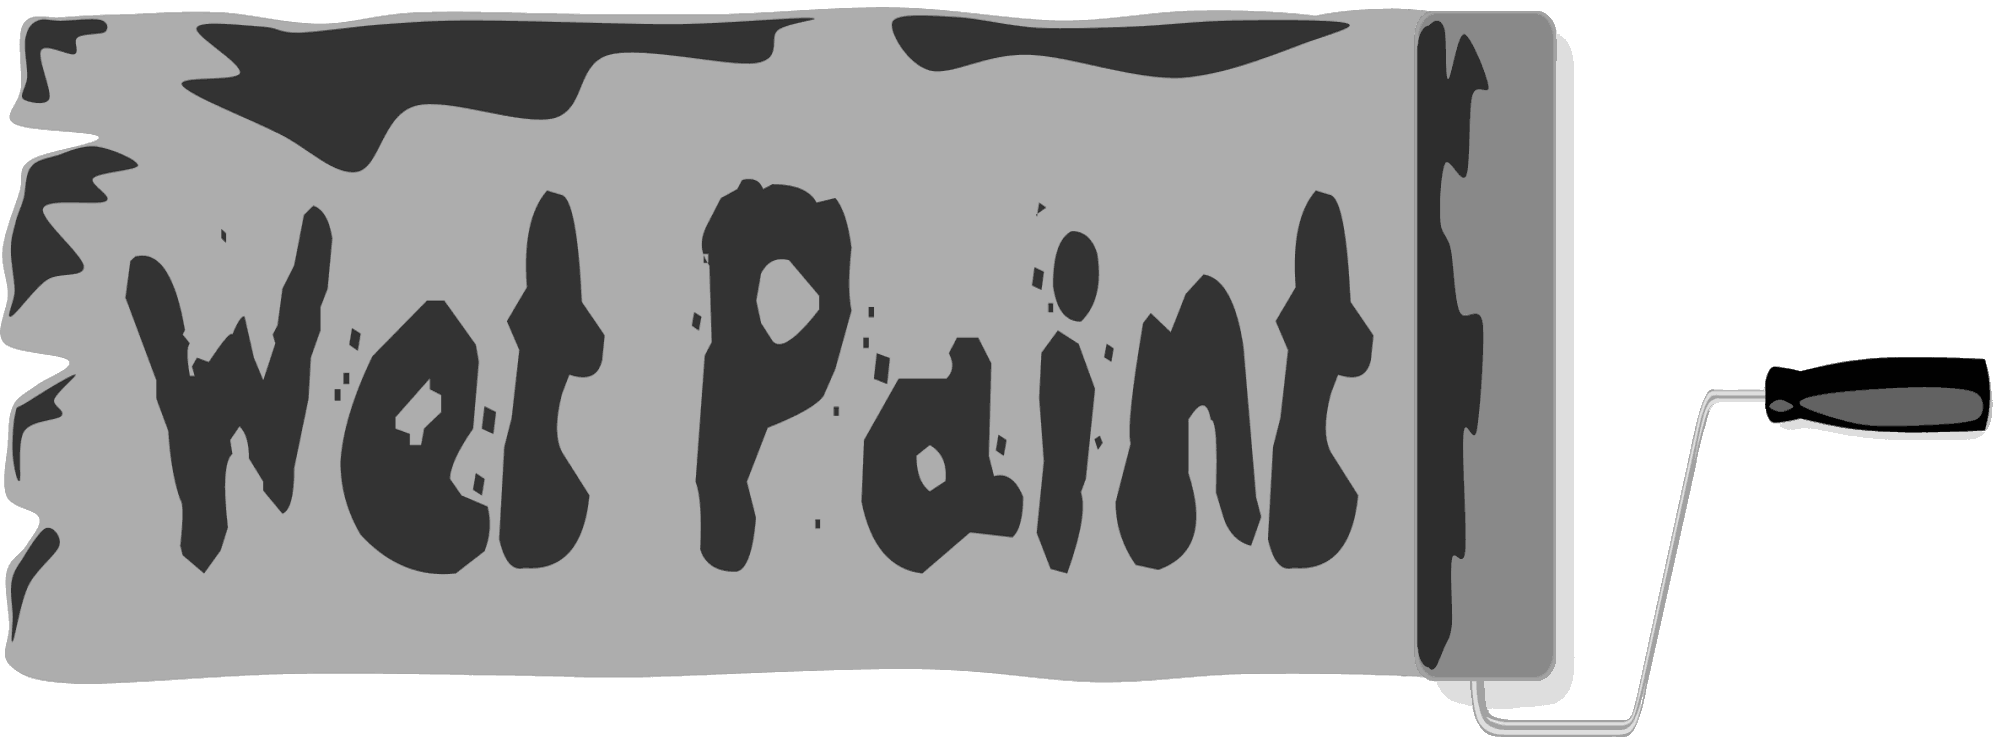 Wet Paint Sign 2 Pages